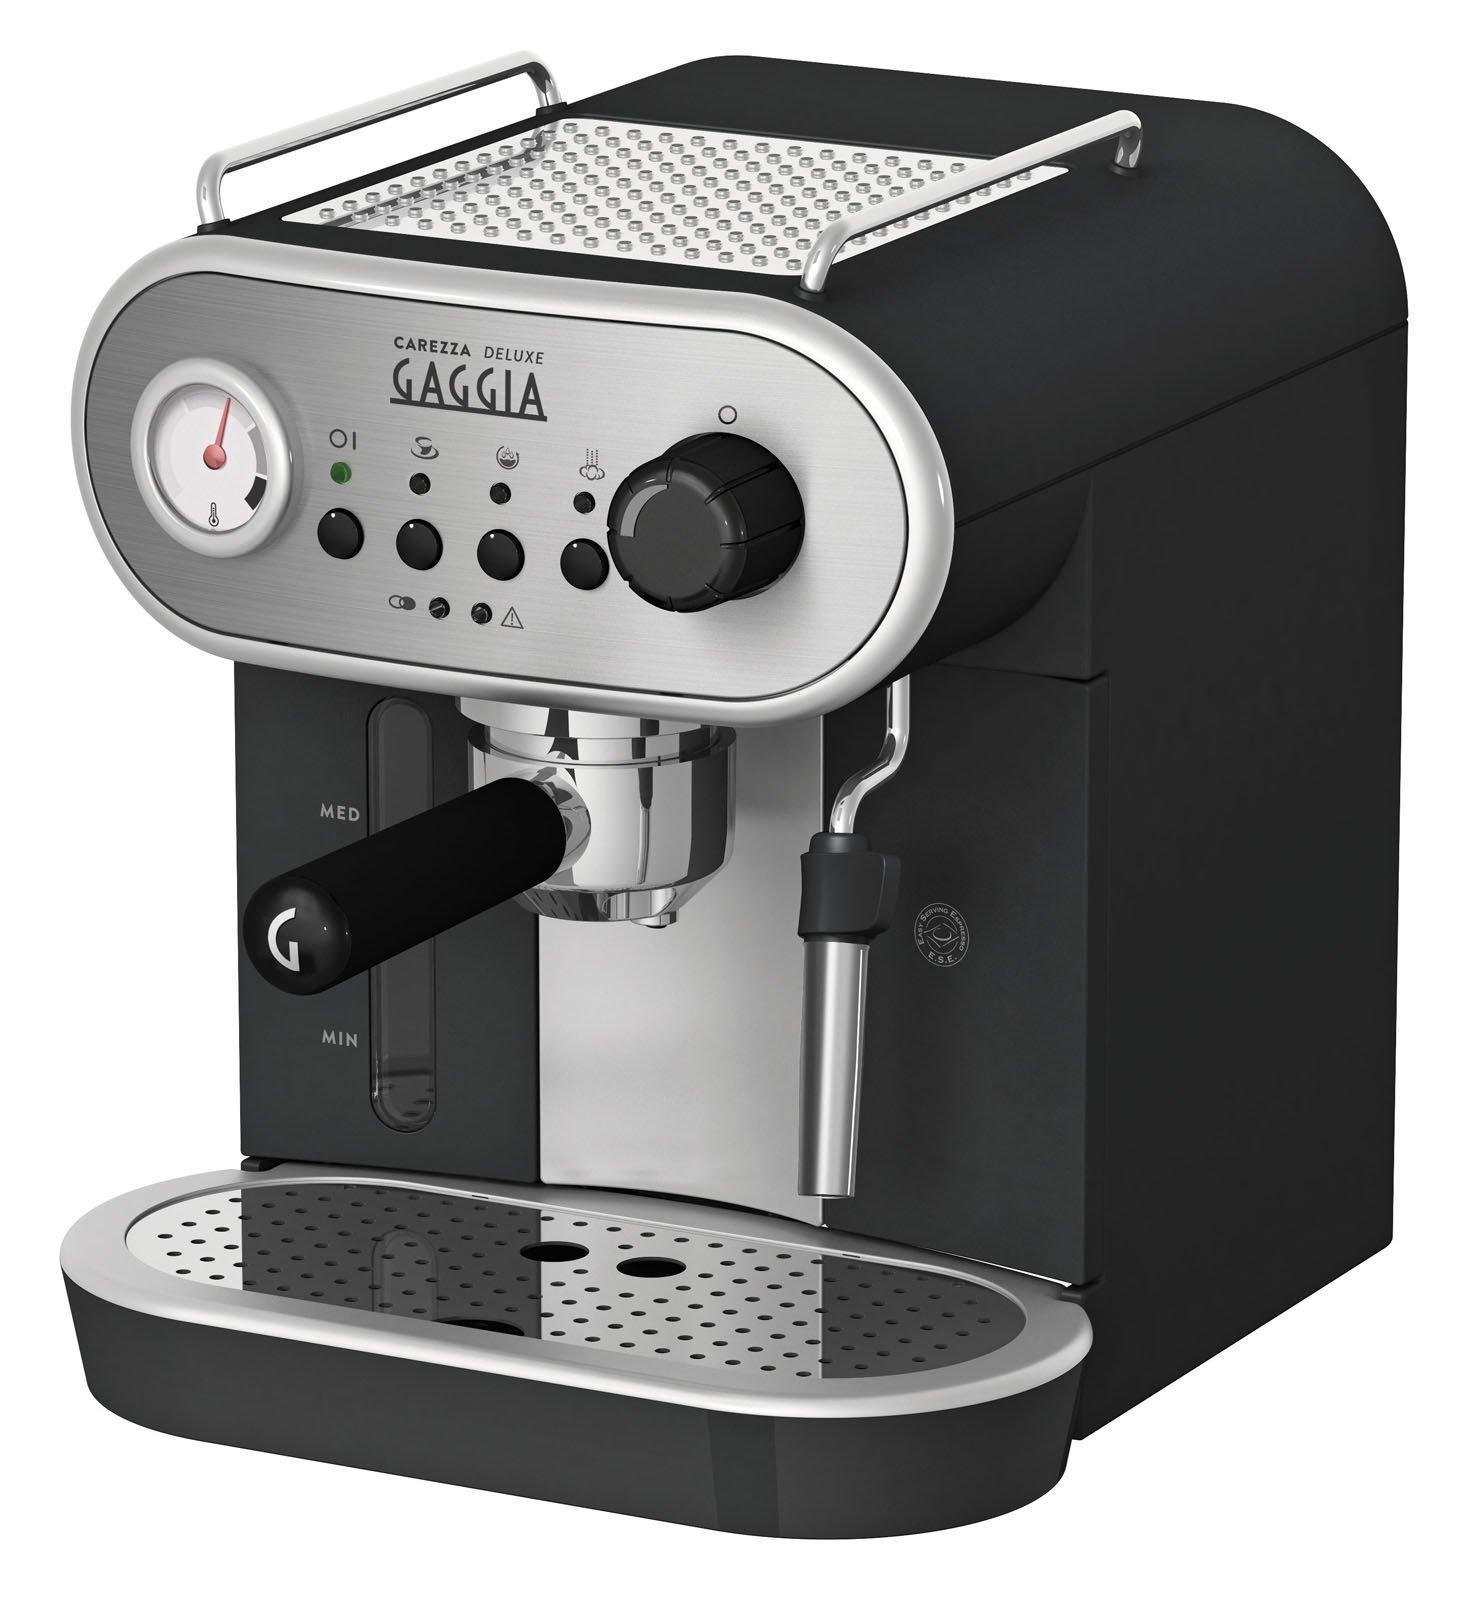 Macchine da caff per l 39 espresso in casa cose di casa - Macchina del caffe bar ...